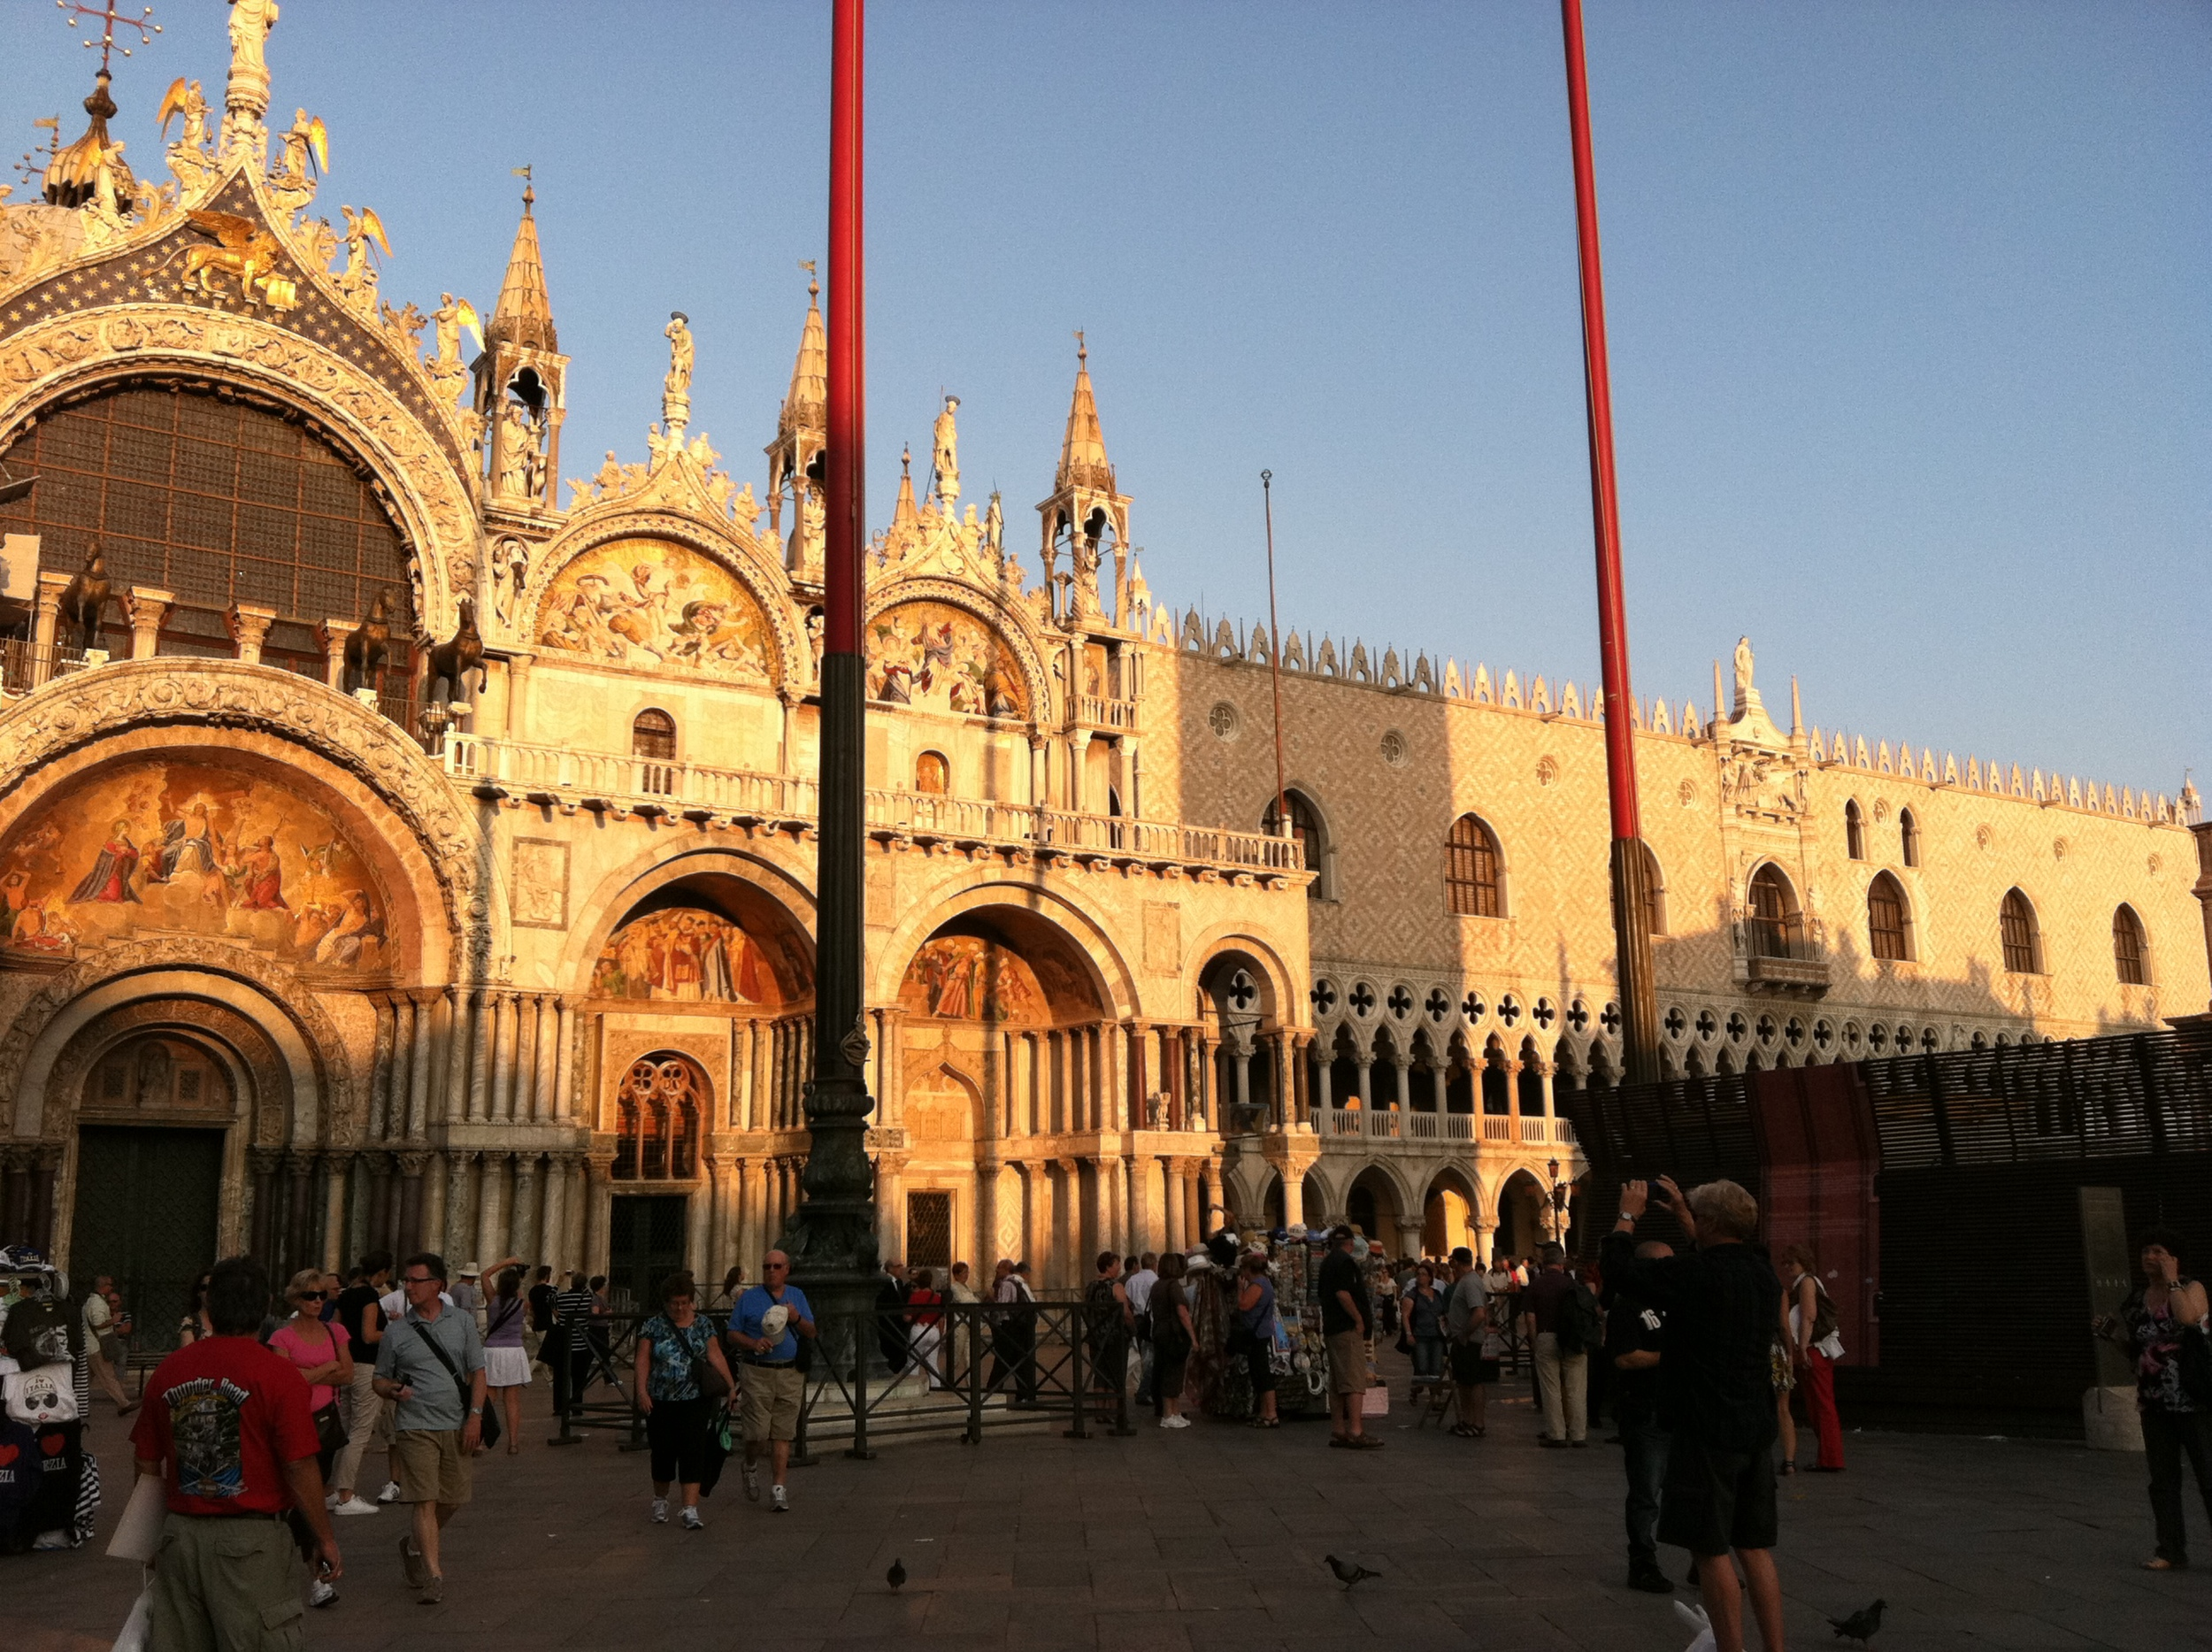 St. Mark's Basicilica | EAT.PRAY.MOVE Yoga | Venice, Italy